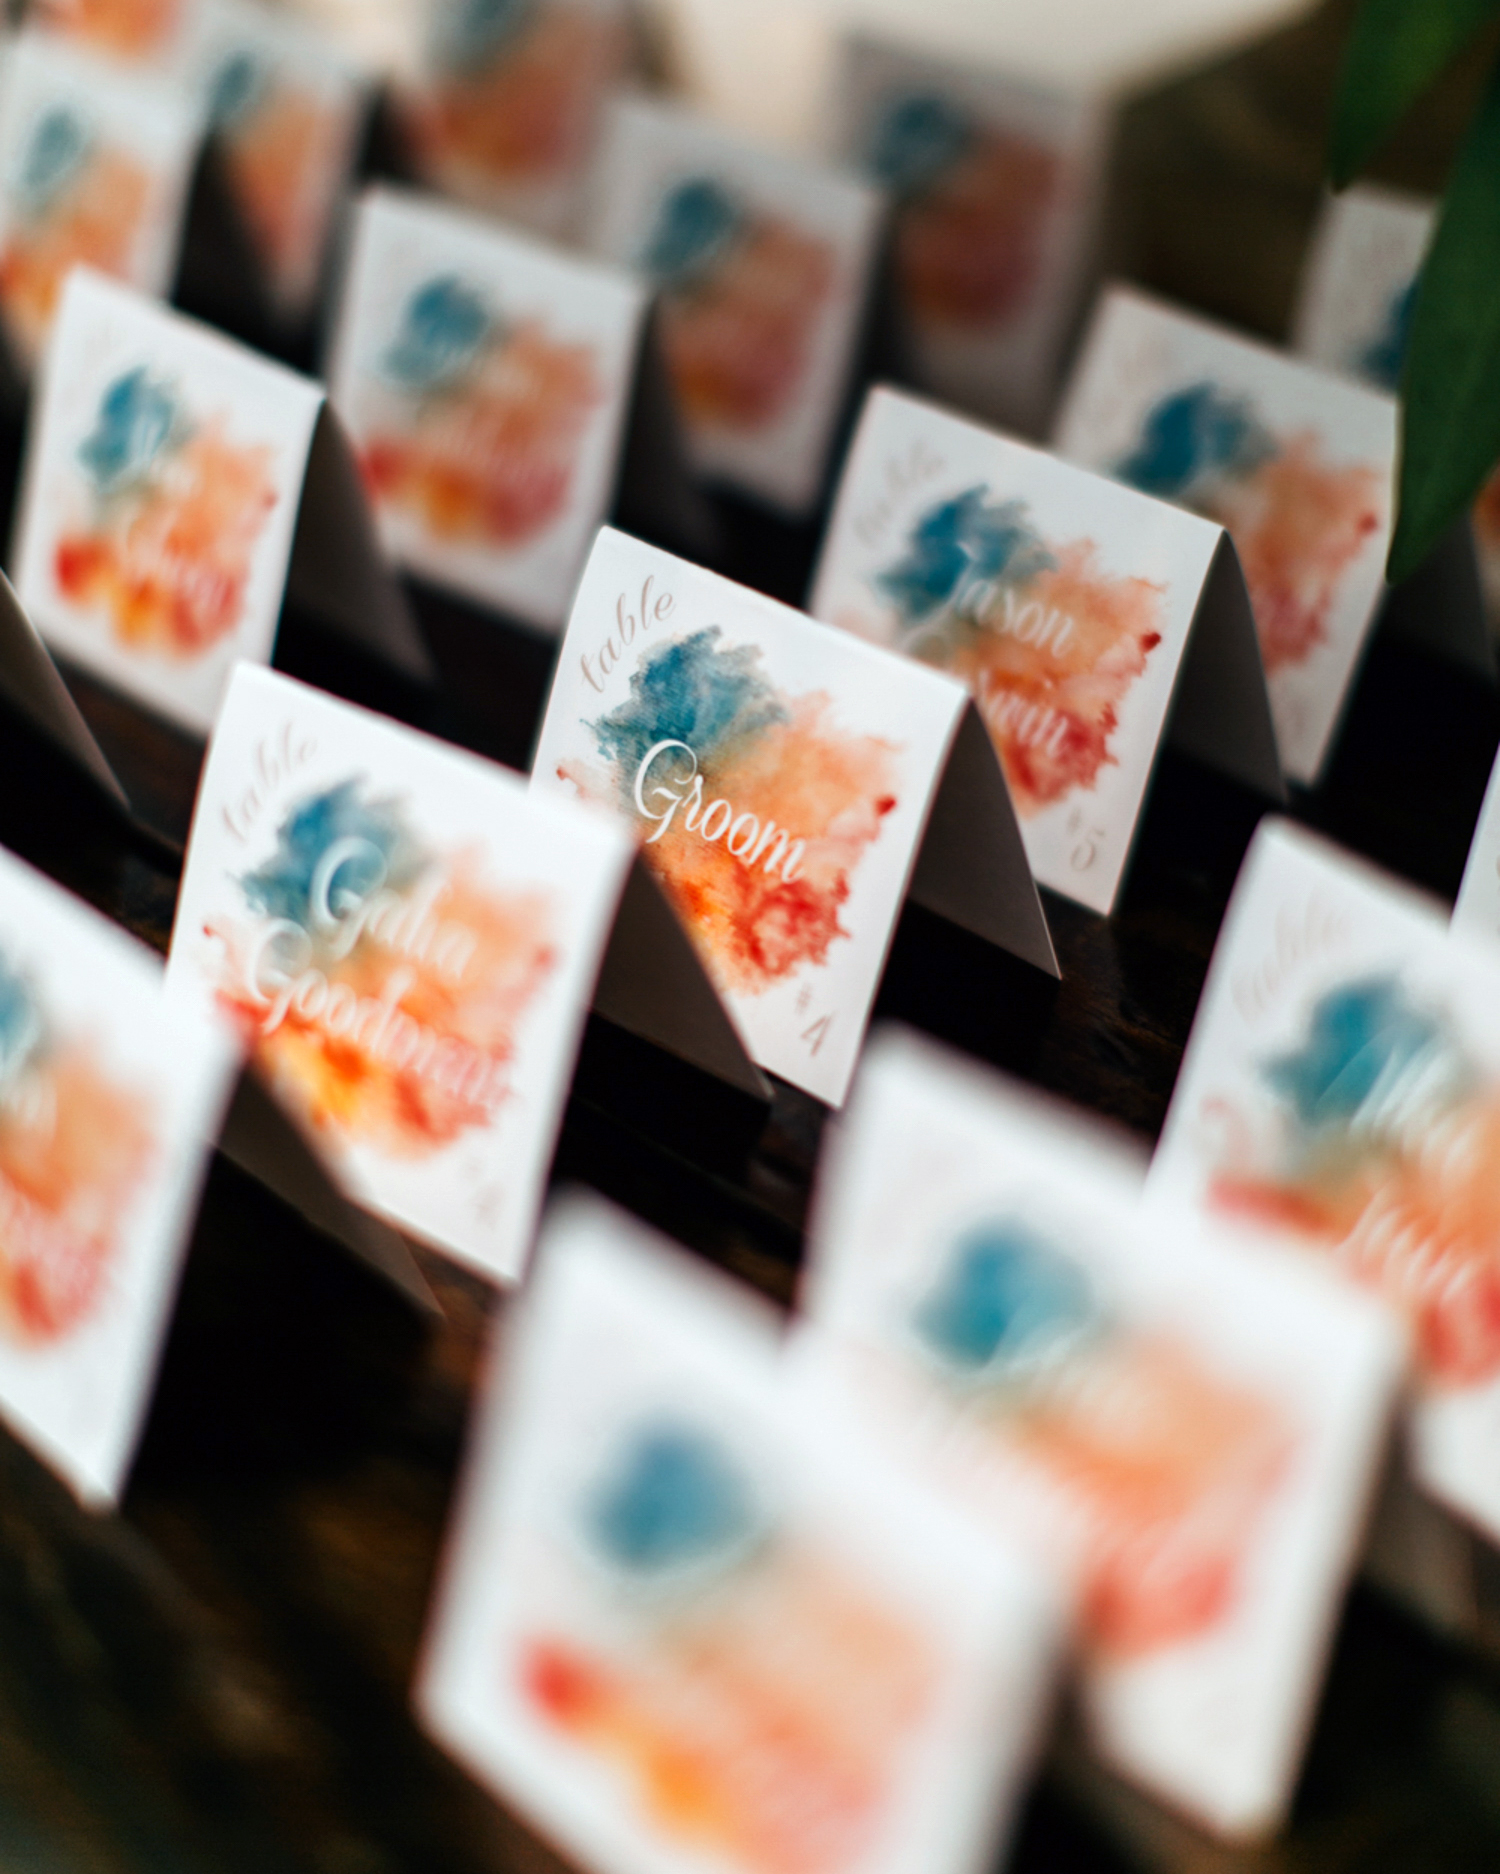 thea-rachit-wedding-escortcards-0749-s112016-0715.jpg